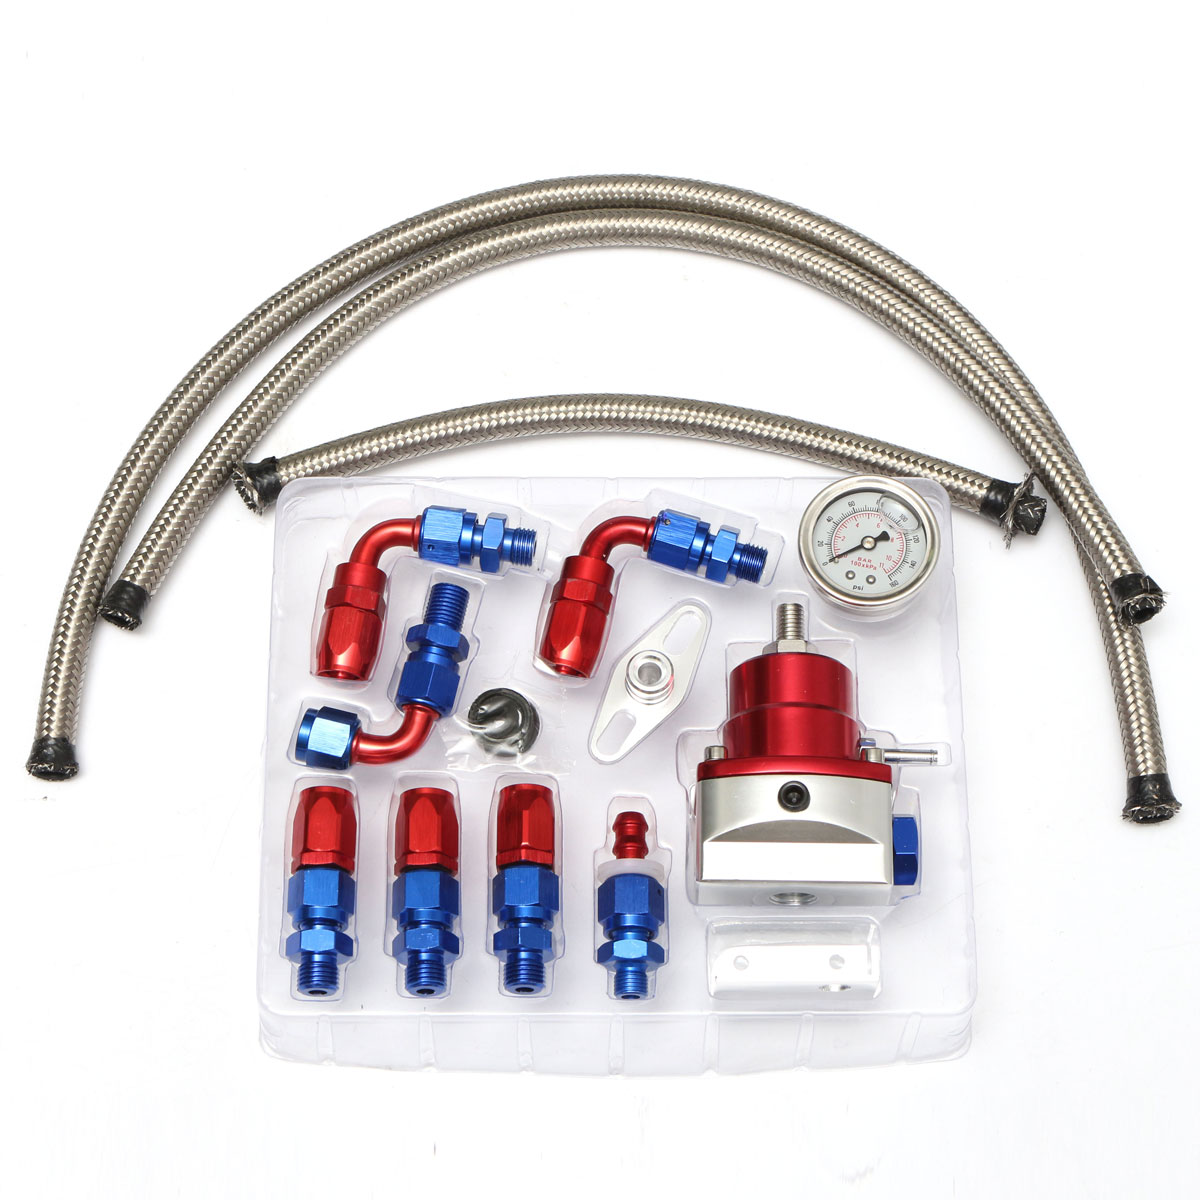 купить UniversaL Adjustable Fuel Pressure Regulator Kit 160PSI Oil Gauge Hose Fitting Kit -6AN Size по цене 3660.31 рублей